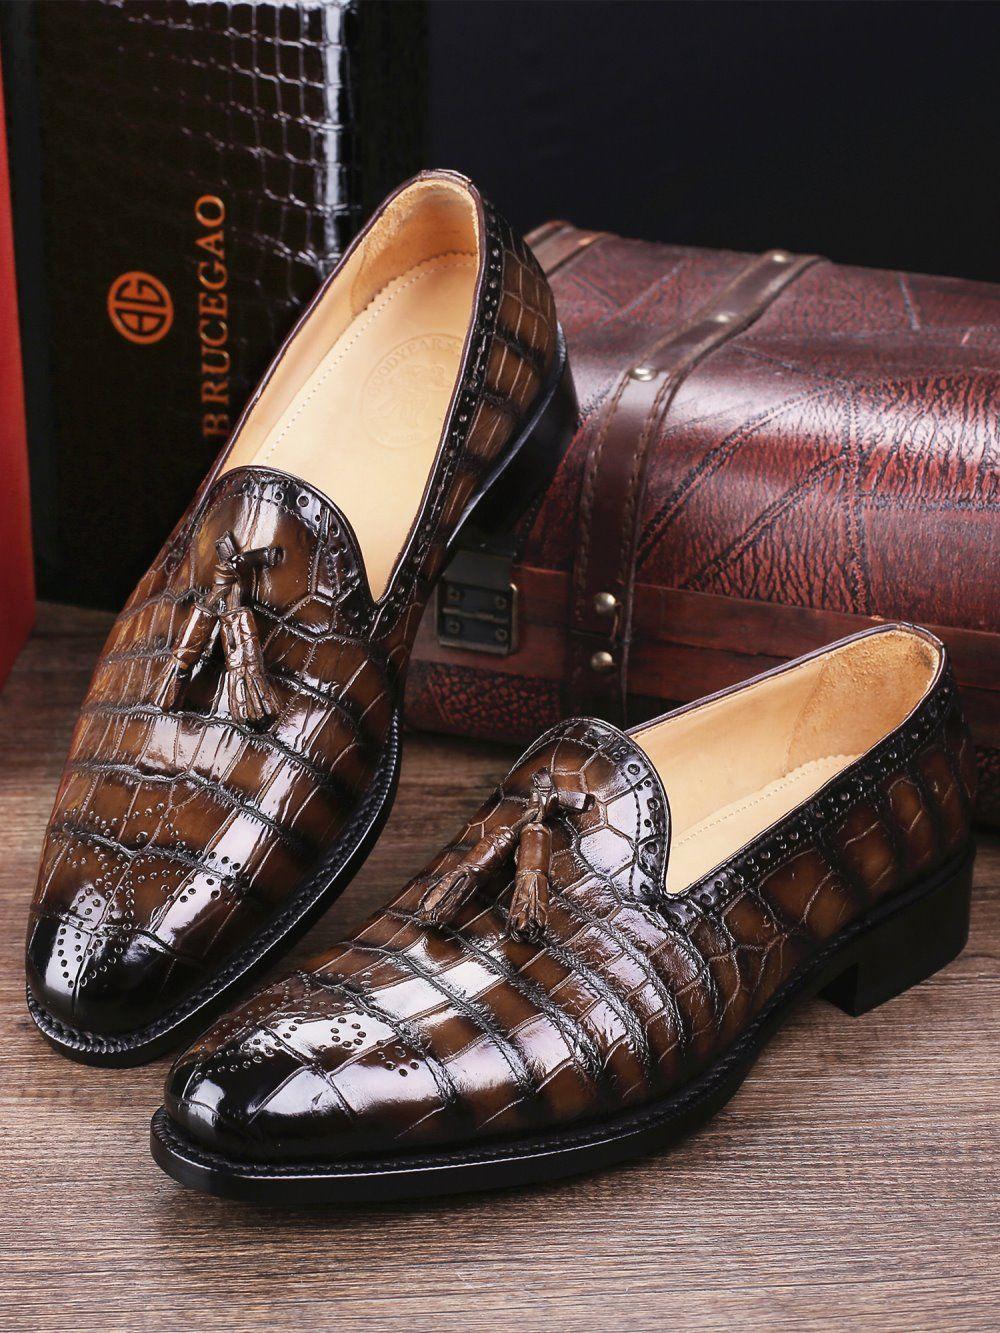 ca39310b76f Classic Alligator Leather Tassel Loafer Comfortable Slip-On Dress ...